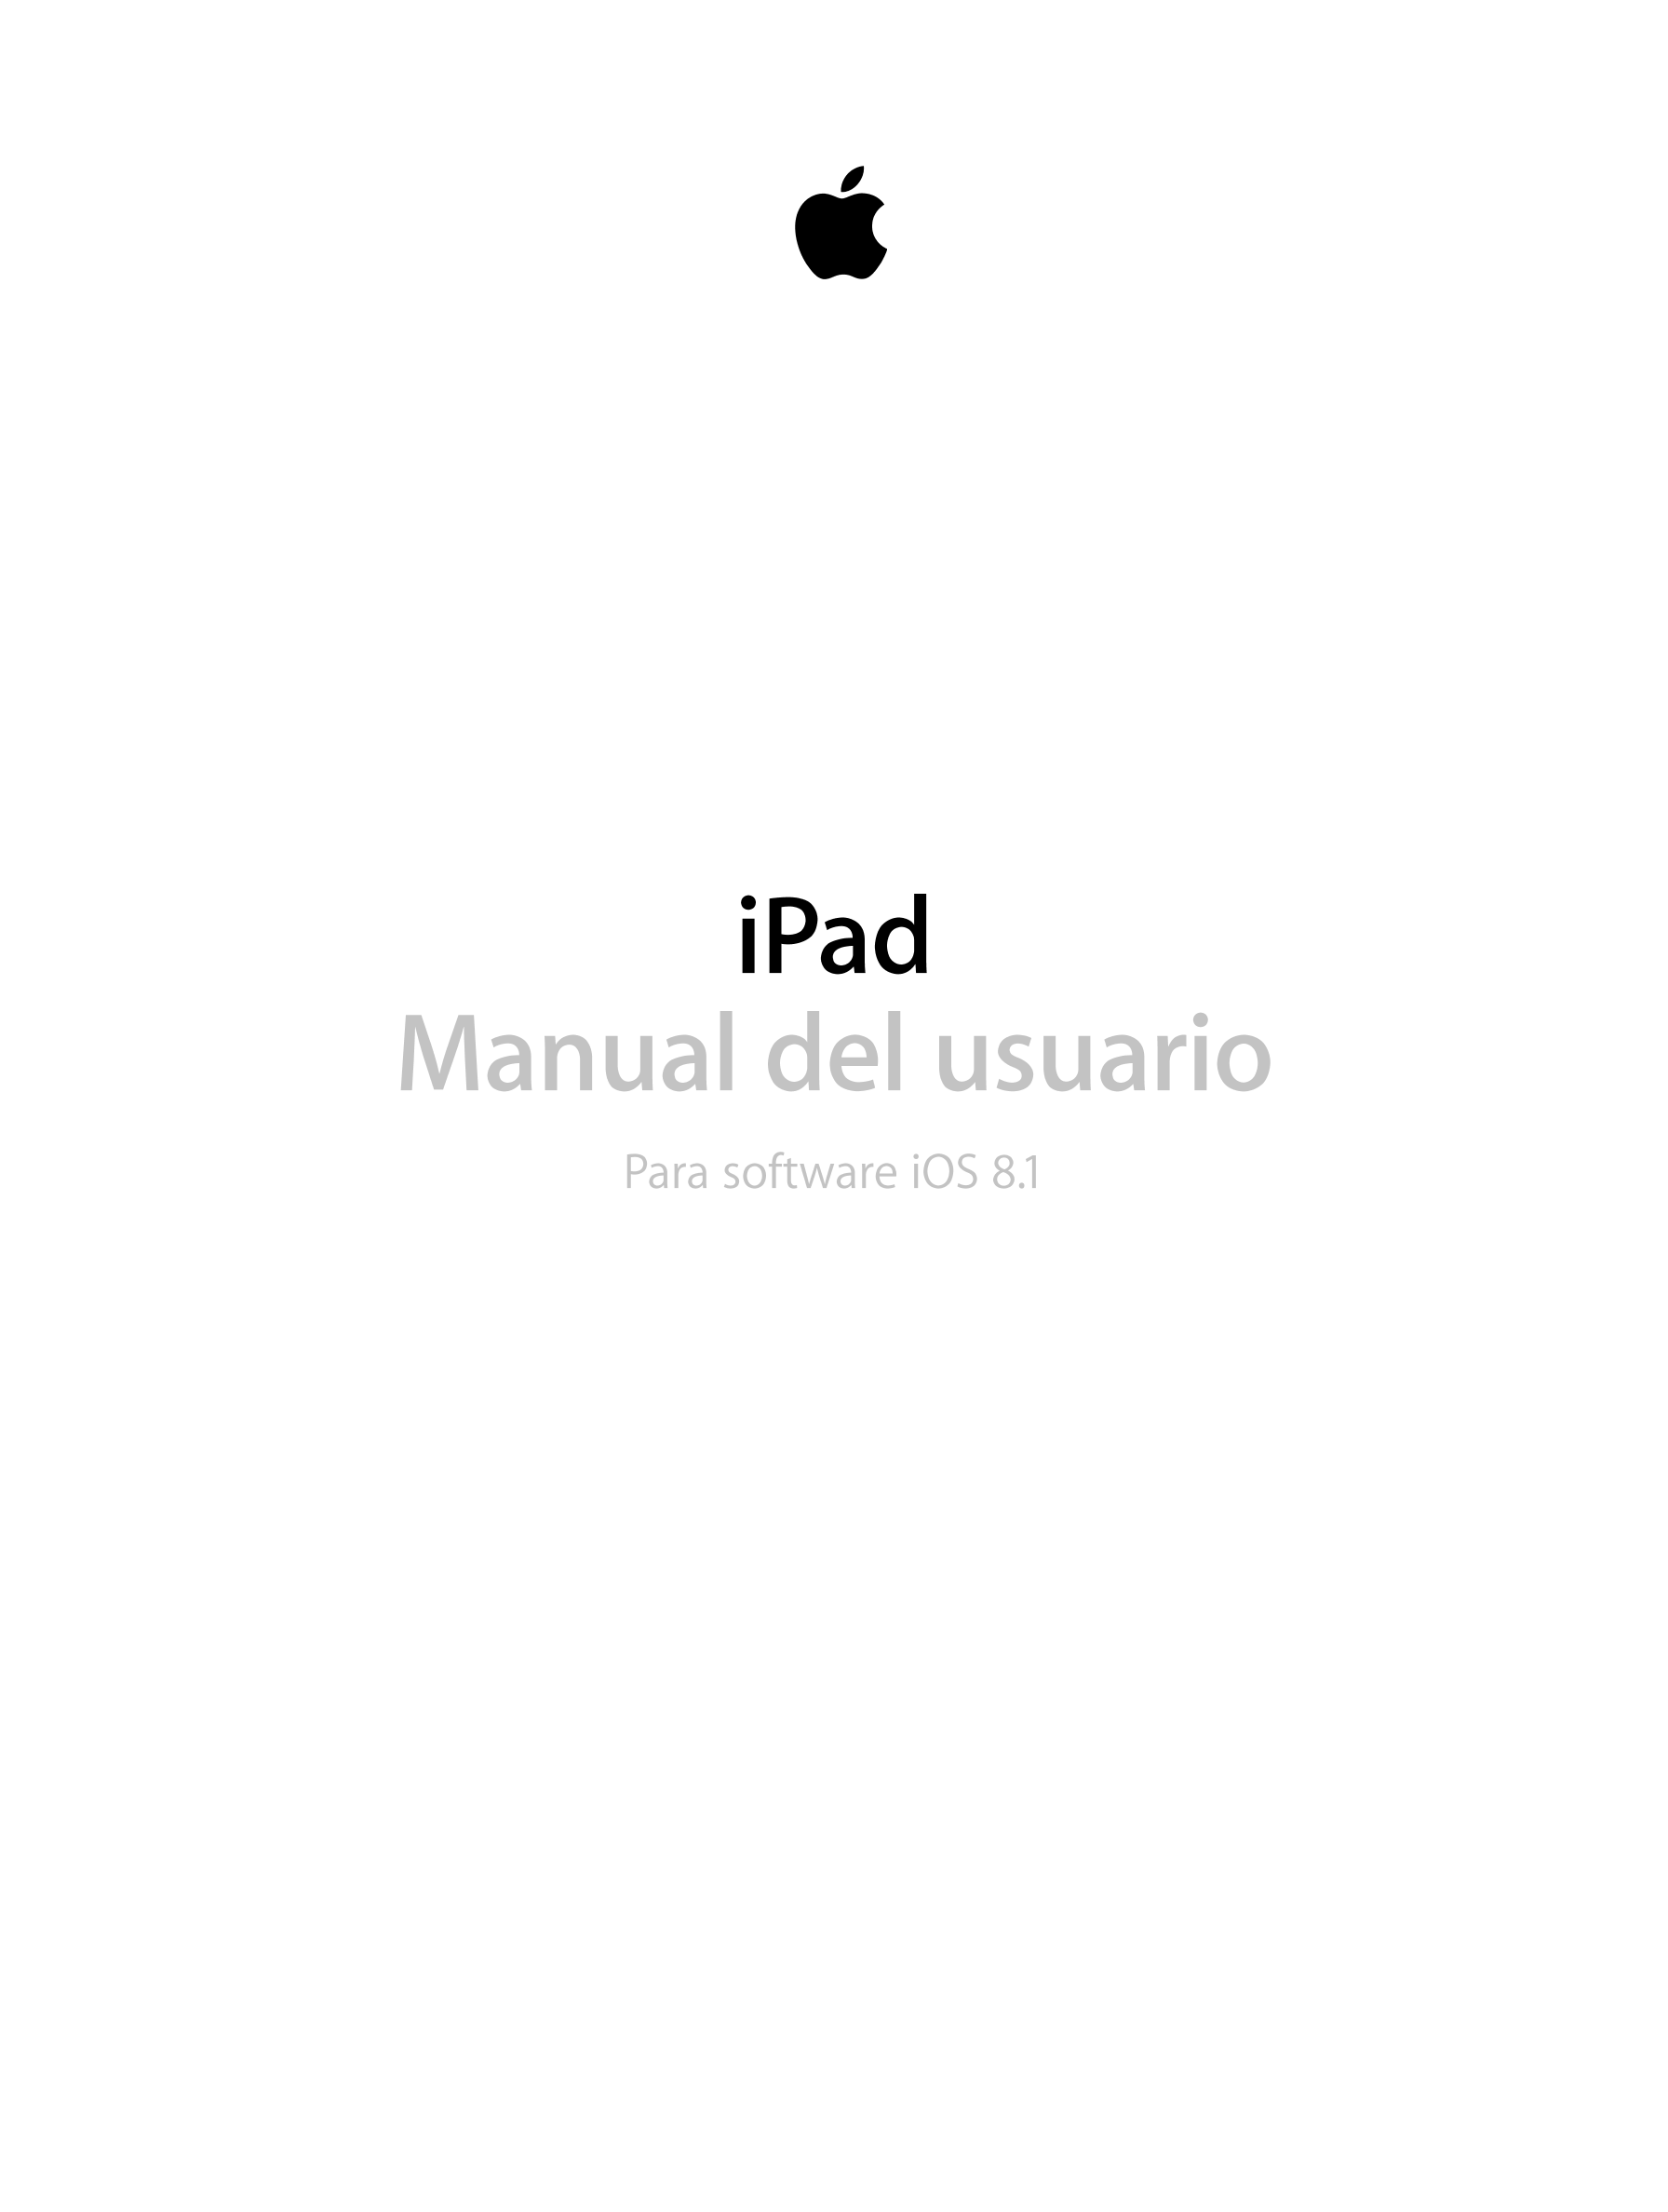 manual apple ipad mini 2 ios 8 device guides rh helpforsmartphone com manual de usuario para alarma de auto extreme manual de usuario ipad